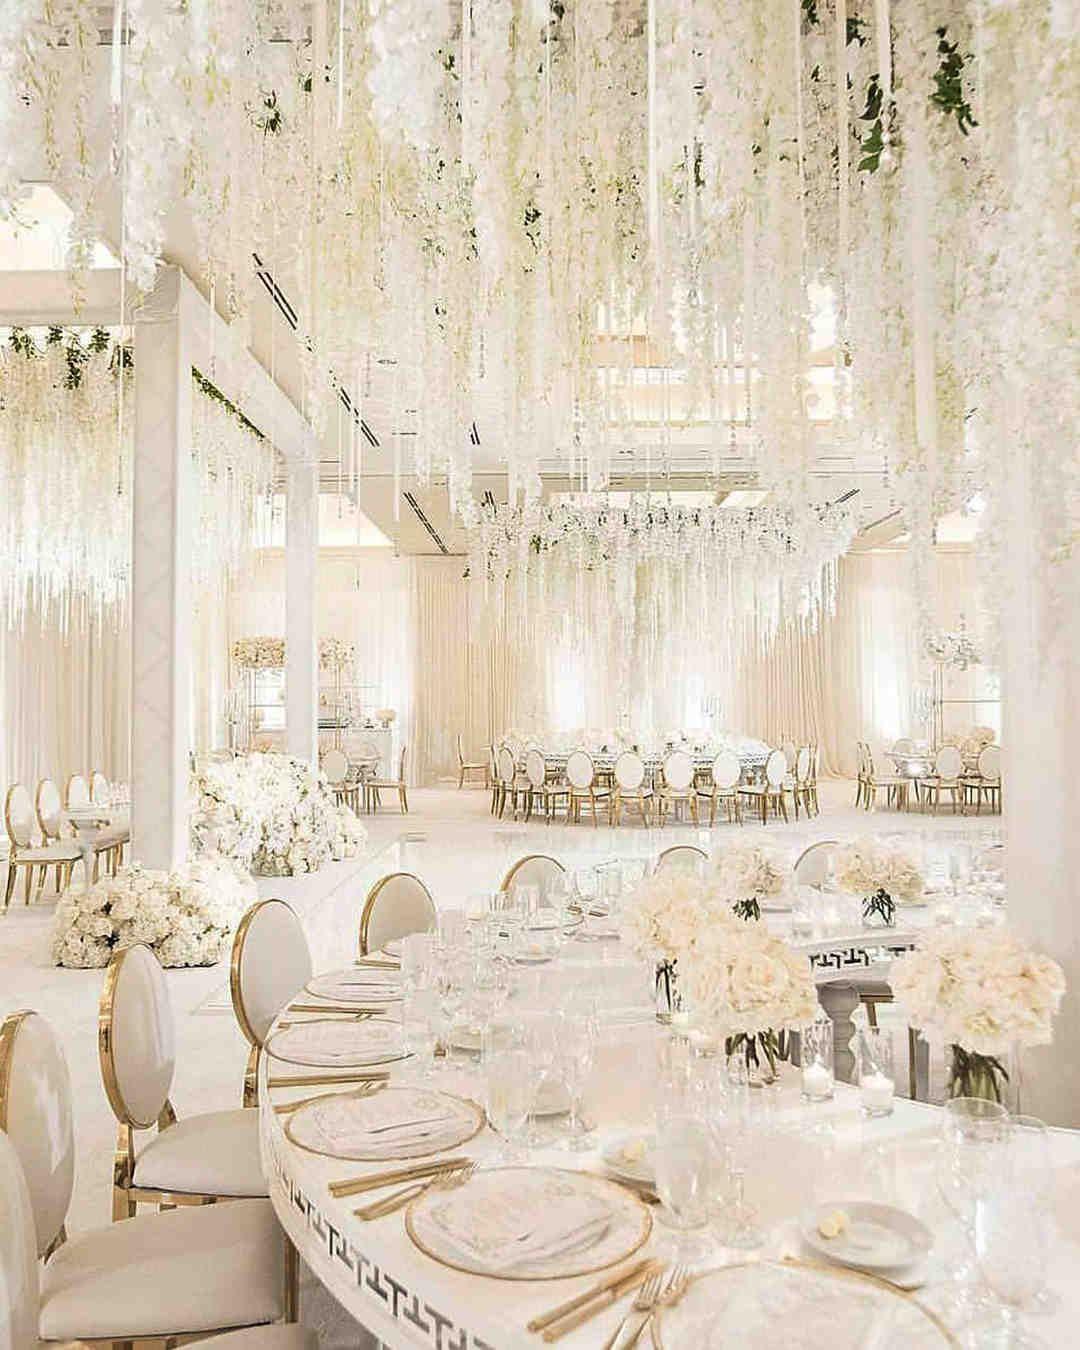 80 Vintage And Elegant Wedding Decoration Ideas In Spring Summer Topbestlife Pa White Wedding Decorations Wedding Decor Elegant Elegant Wedding Reception